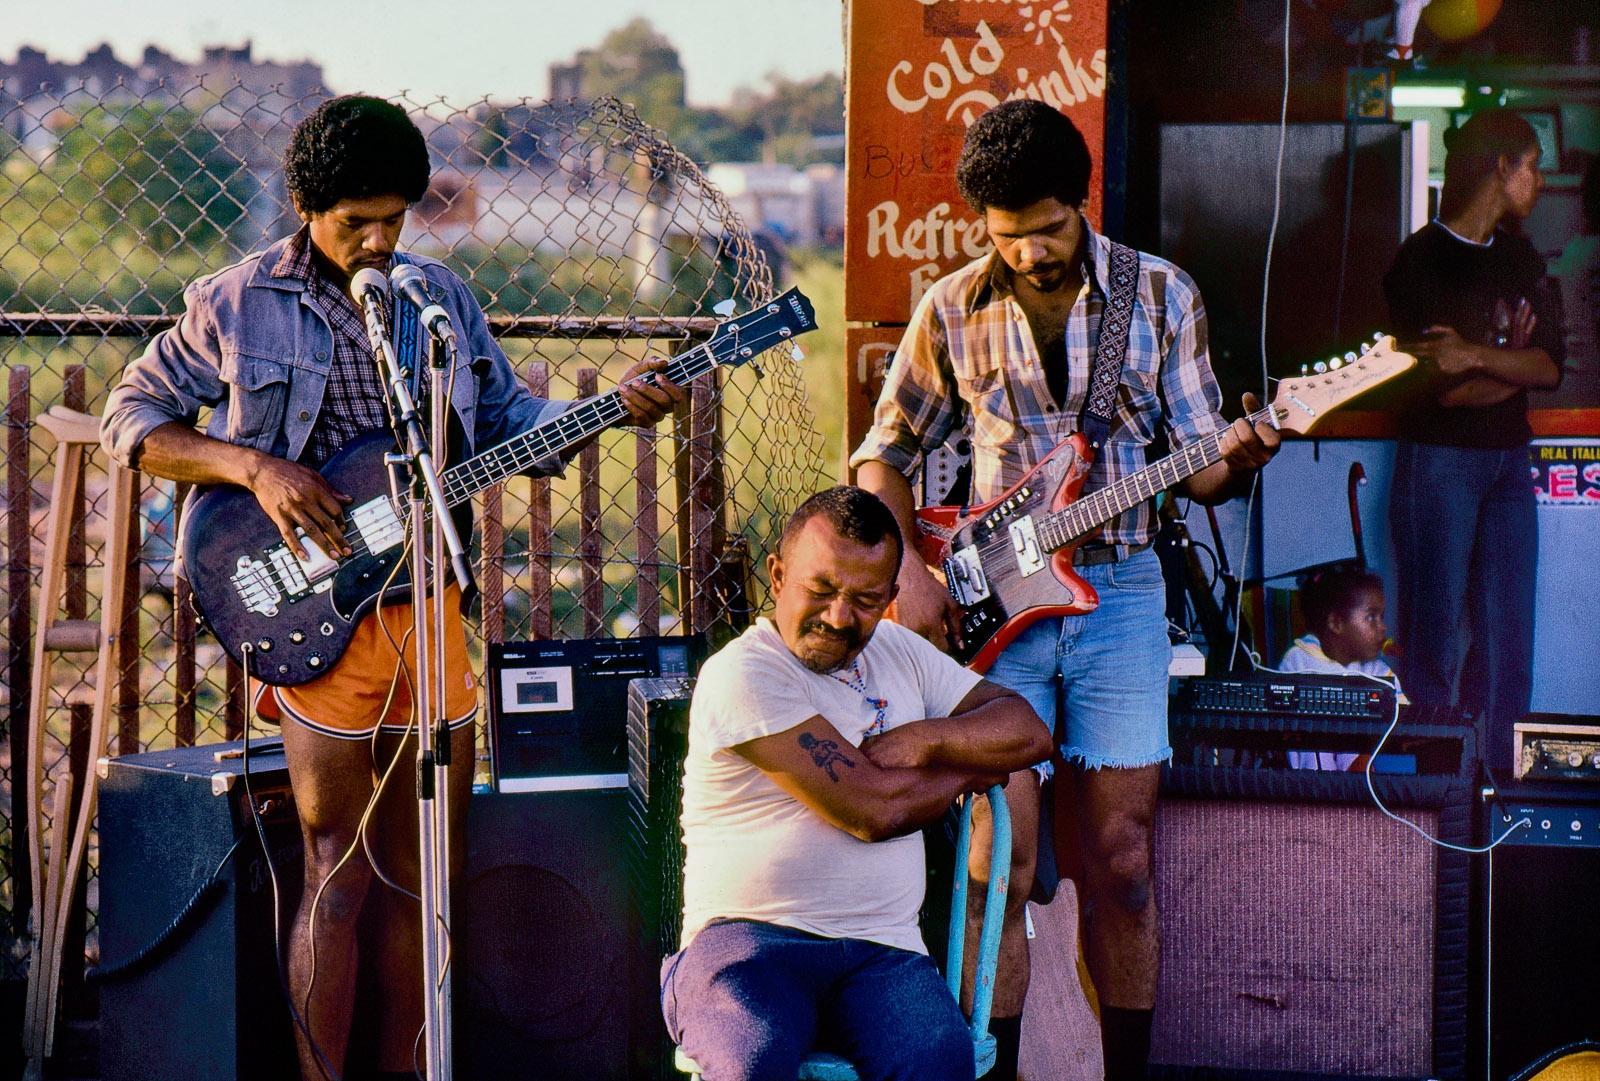 Coney Island boardwalk musicians